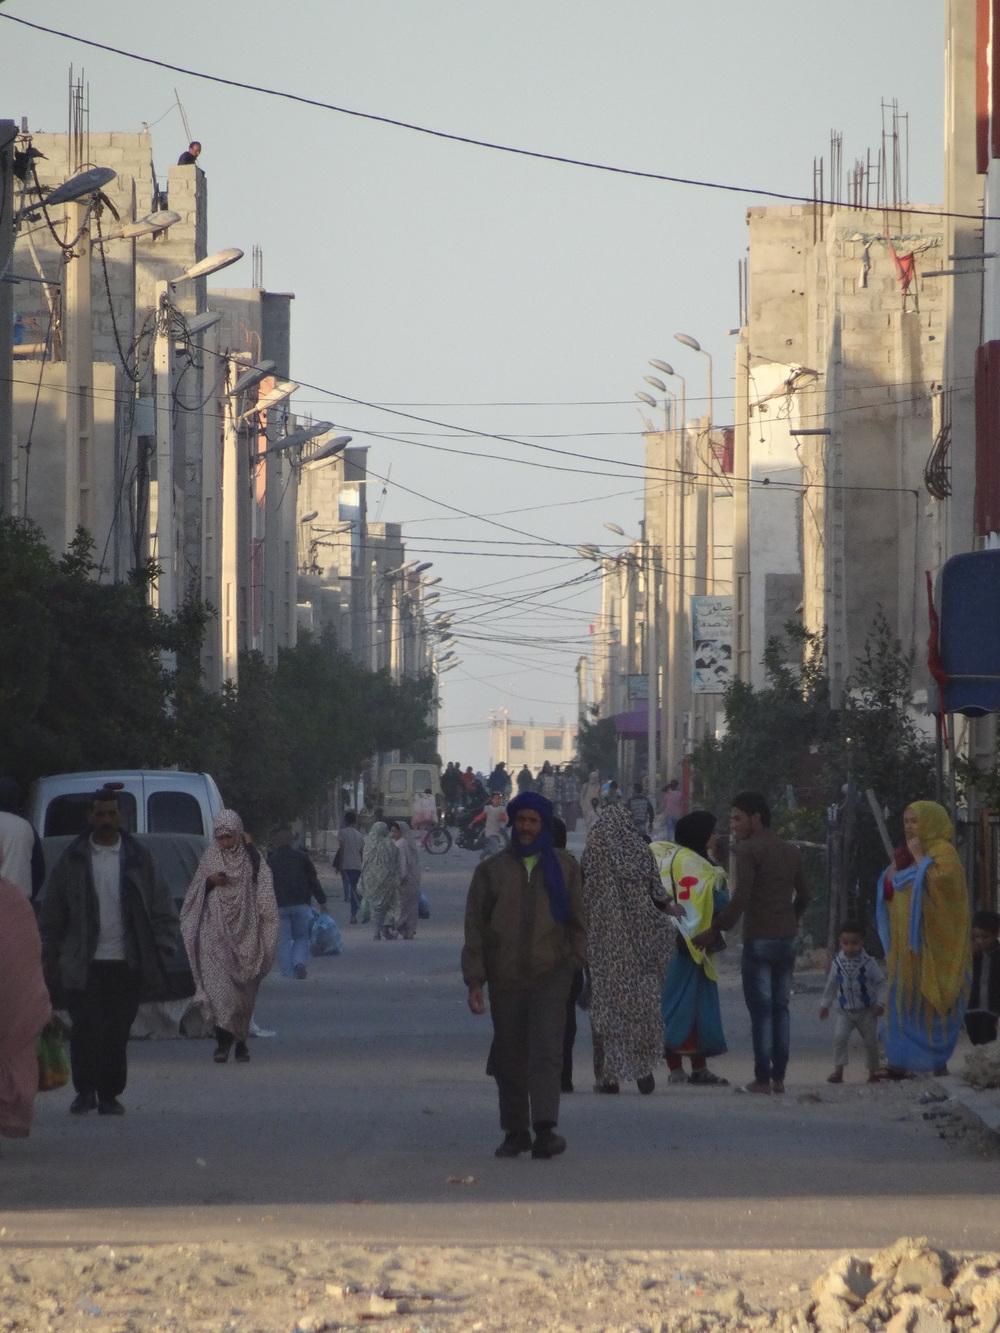 Town life in Western Sahara